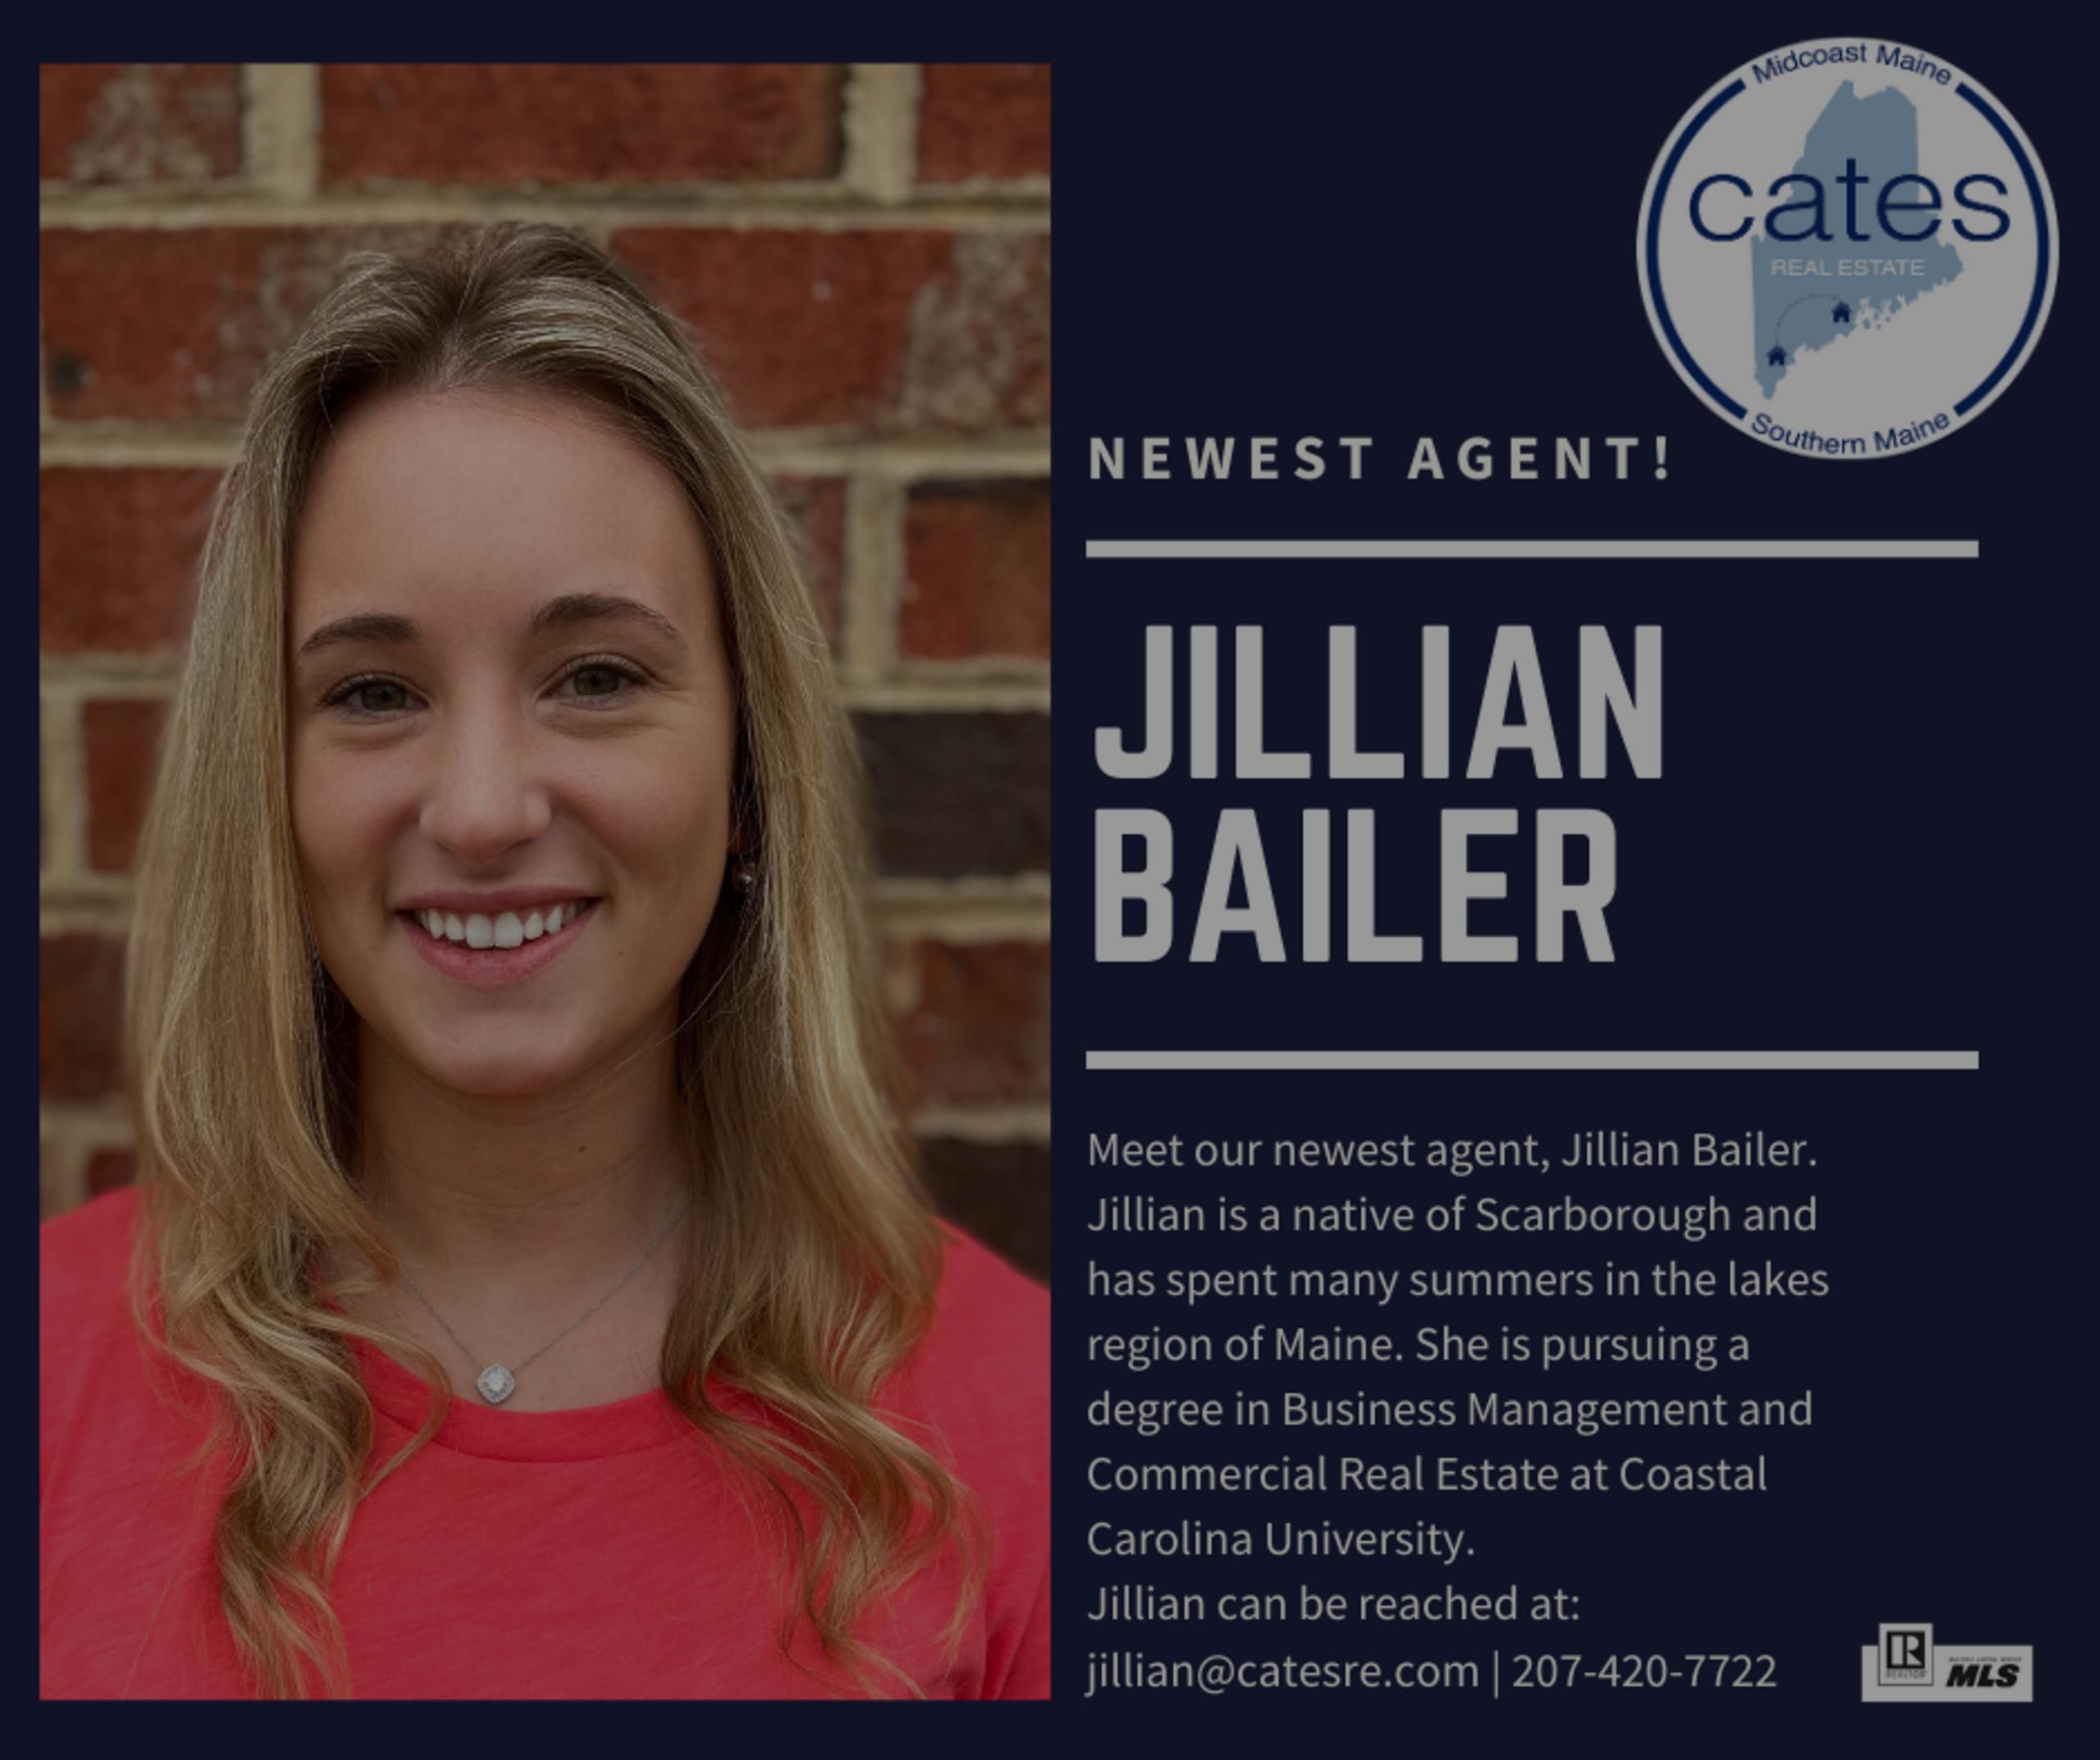 Cates Real Estate Welcomes Jillian Bailer